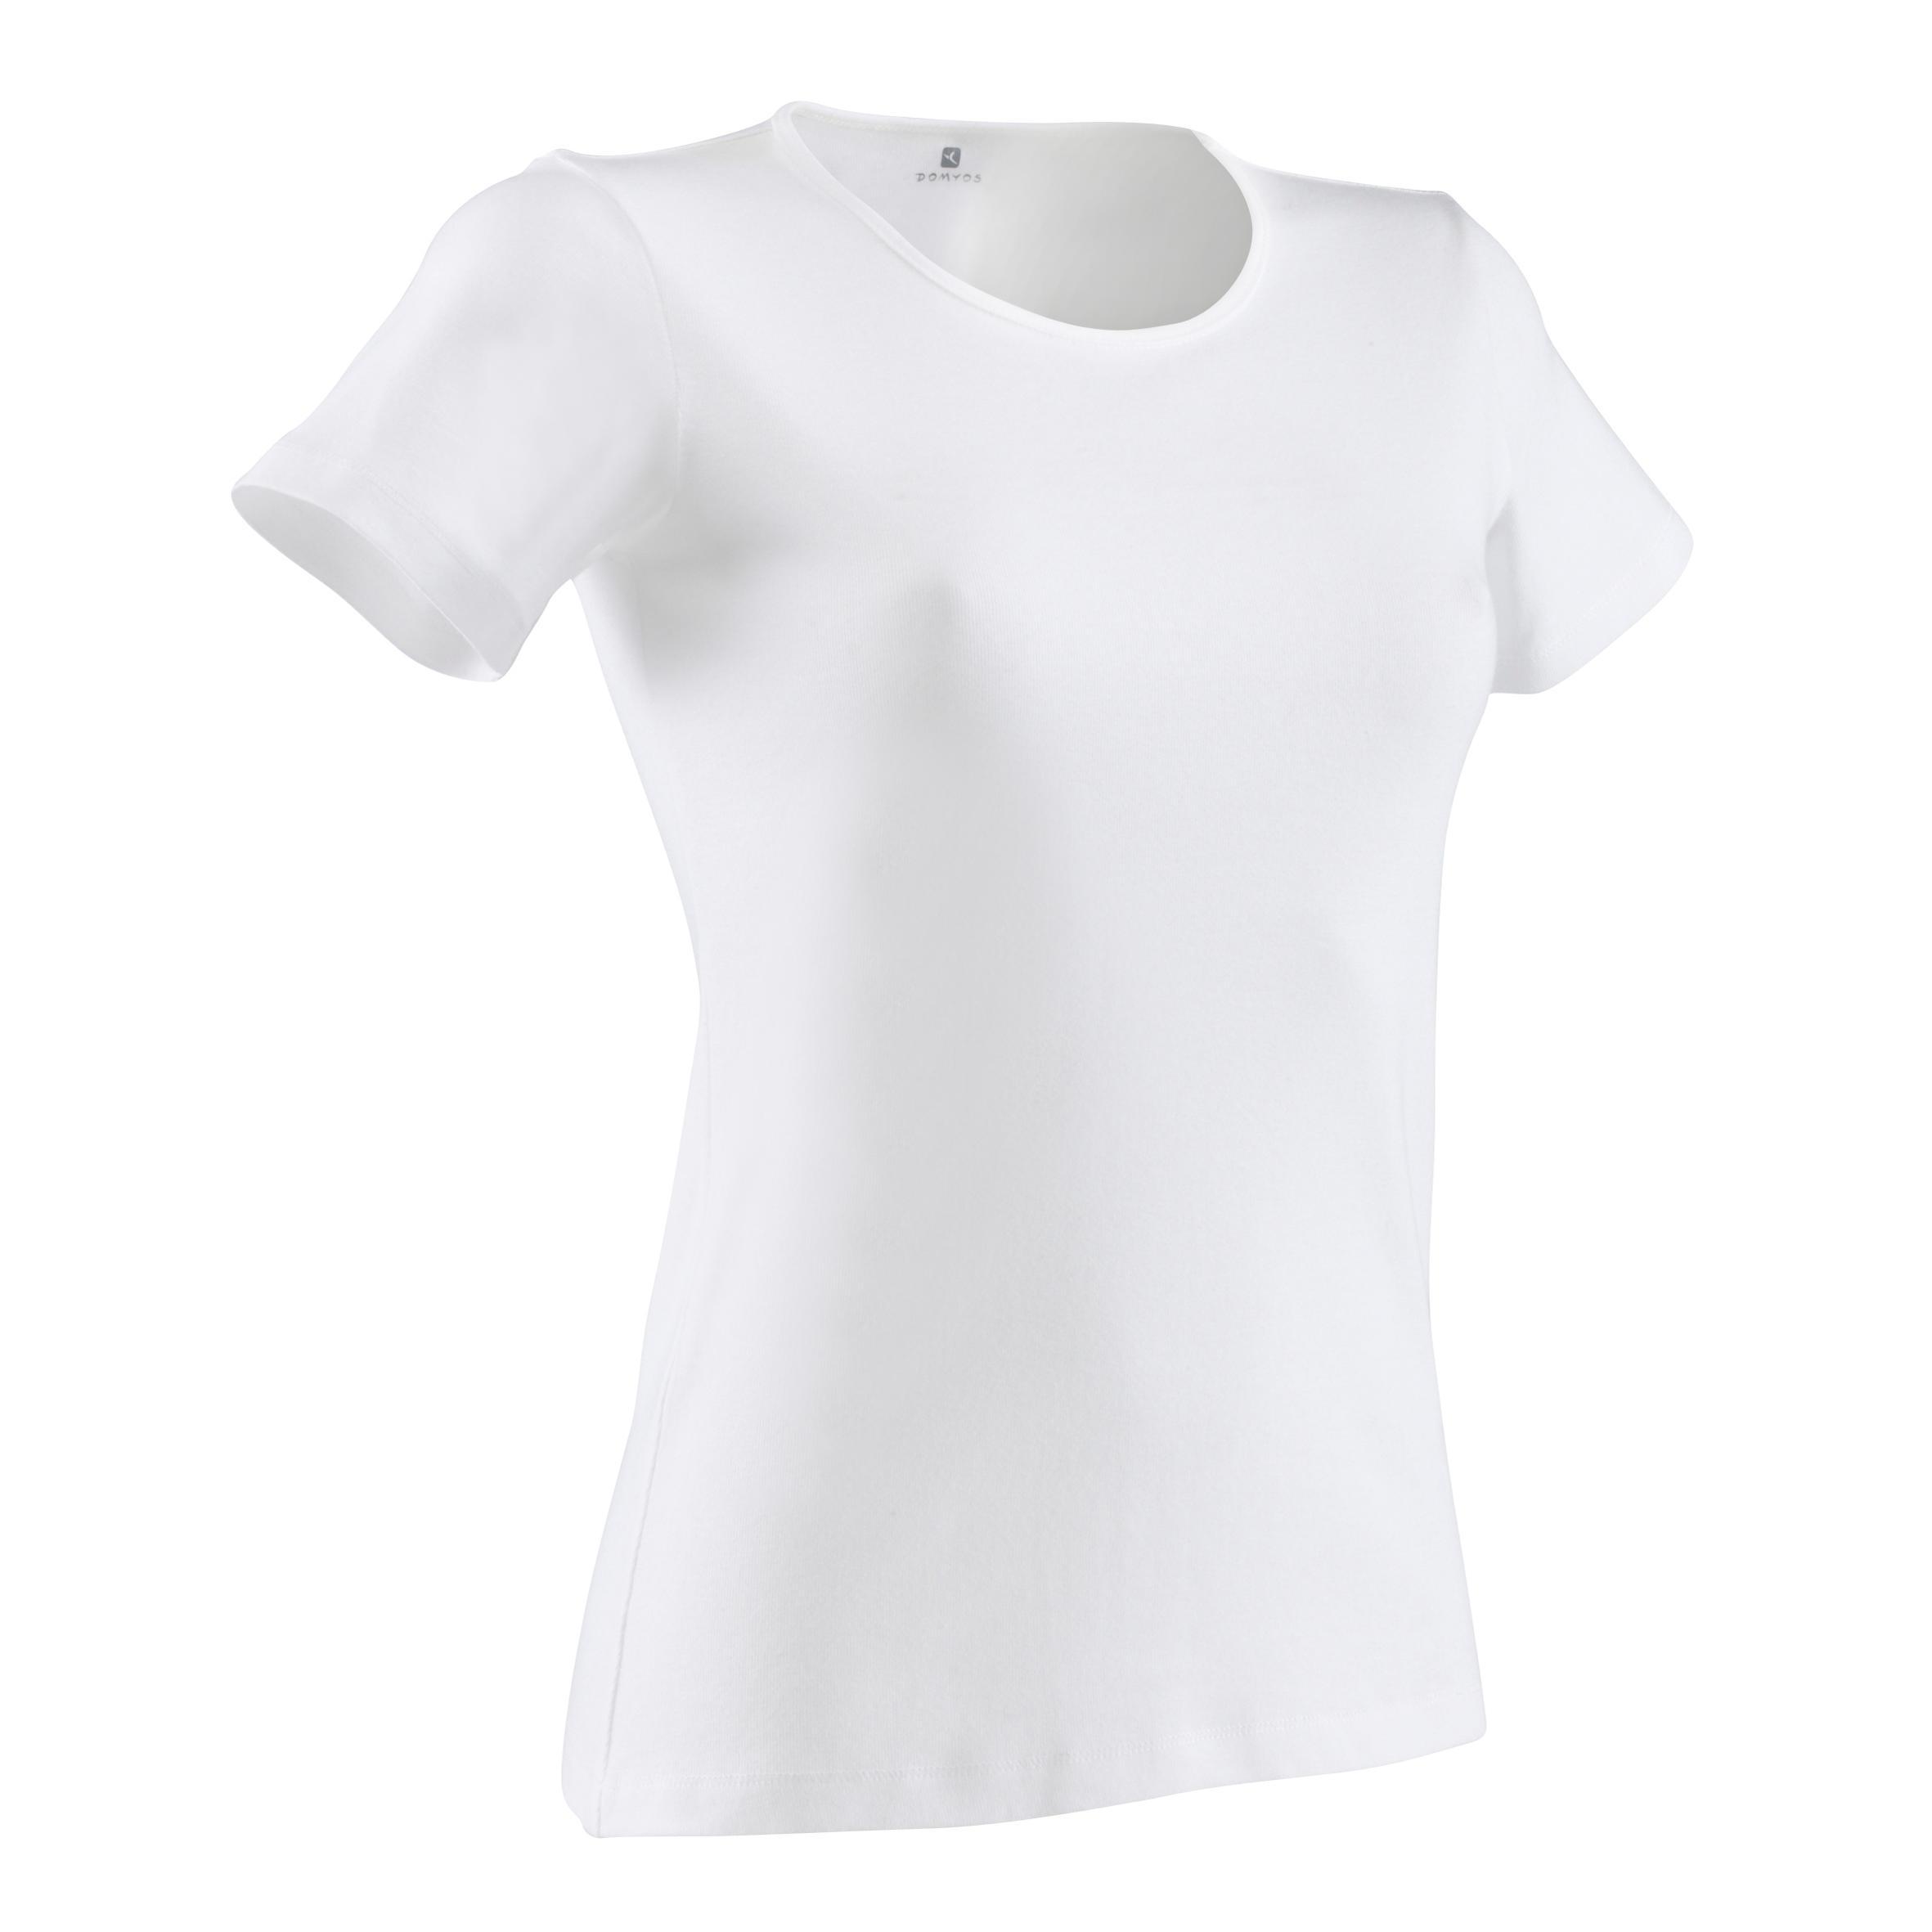 Sportee Women's Gym & Pilates T-Shirt - Putih